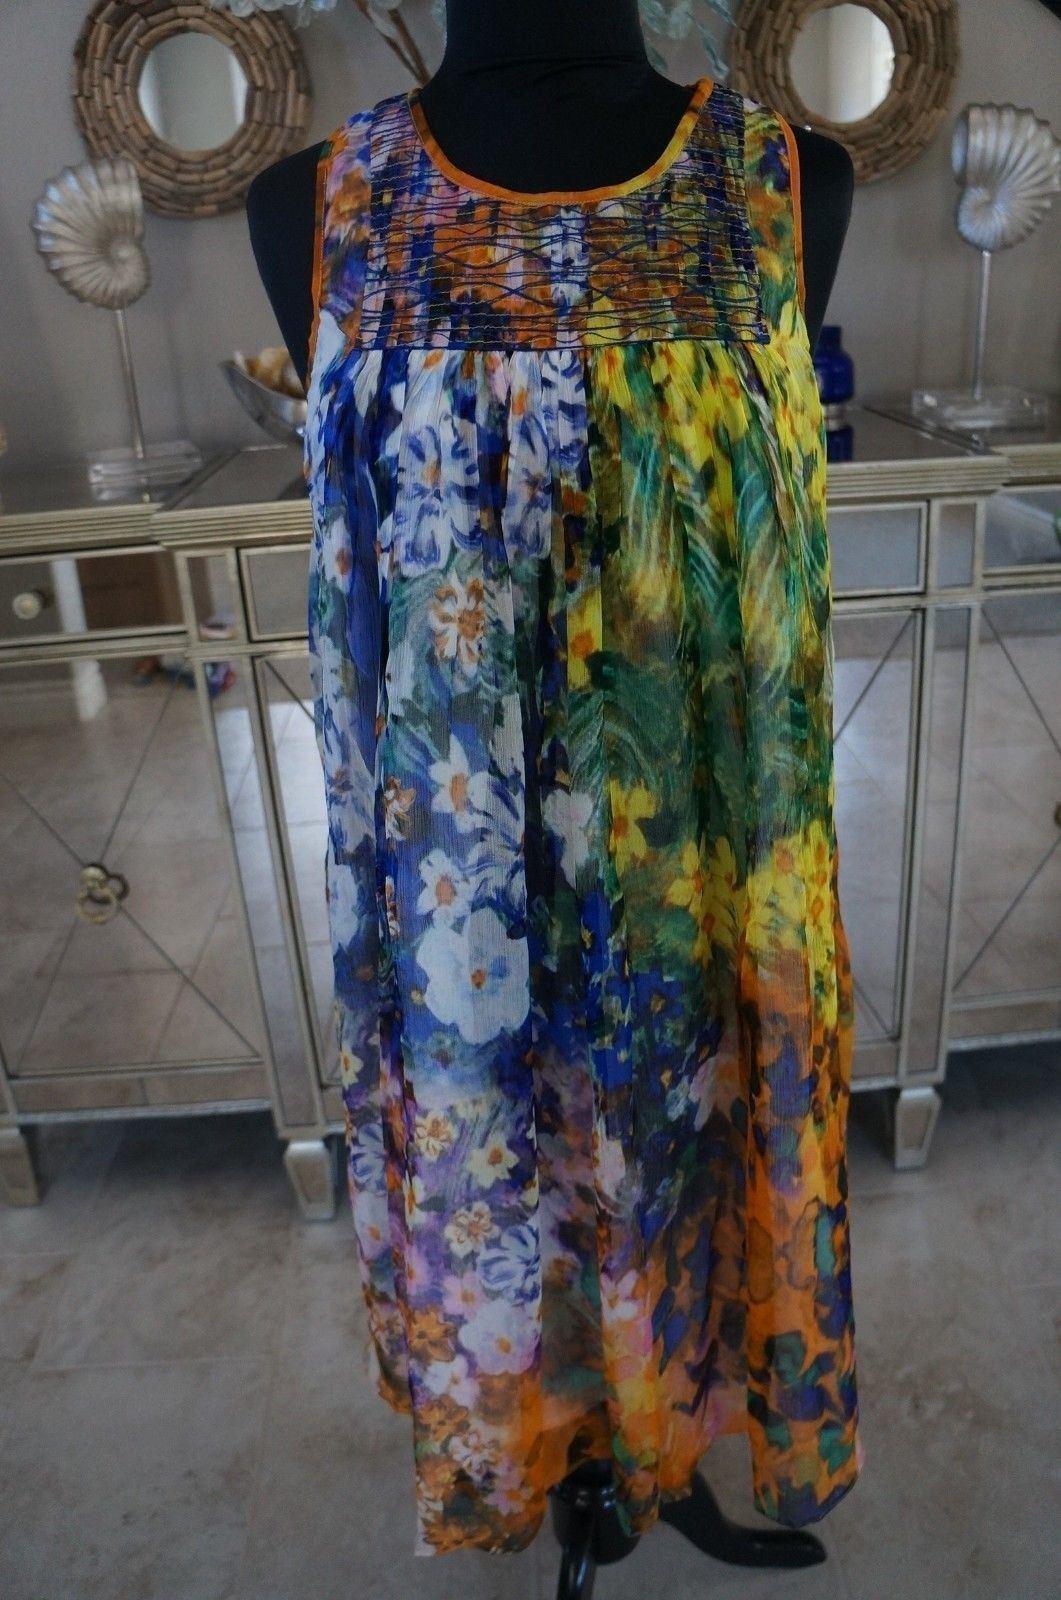 NEW Pashma Petanu Anthropologie Silk Hand Woven & Printed Dress SOFT S M RP